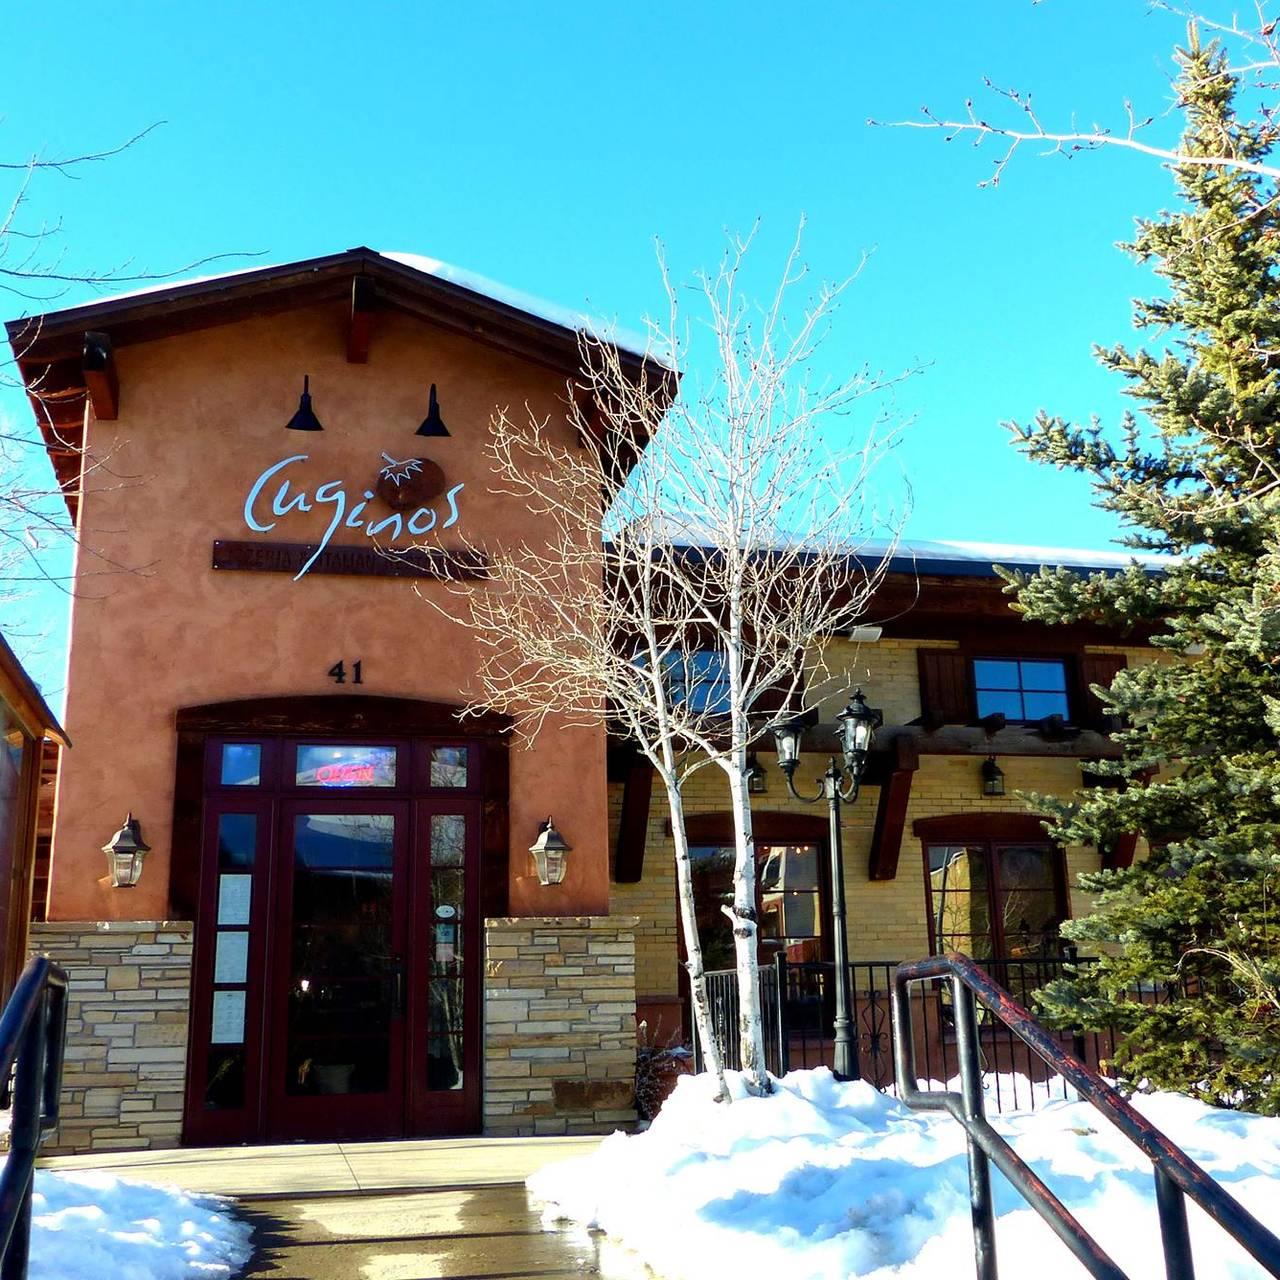 Cugino\'s Pizzeria & Italian Restaurant - Steamboat Springs, CO ...